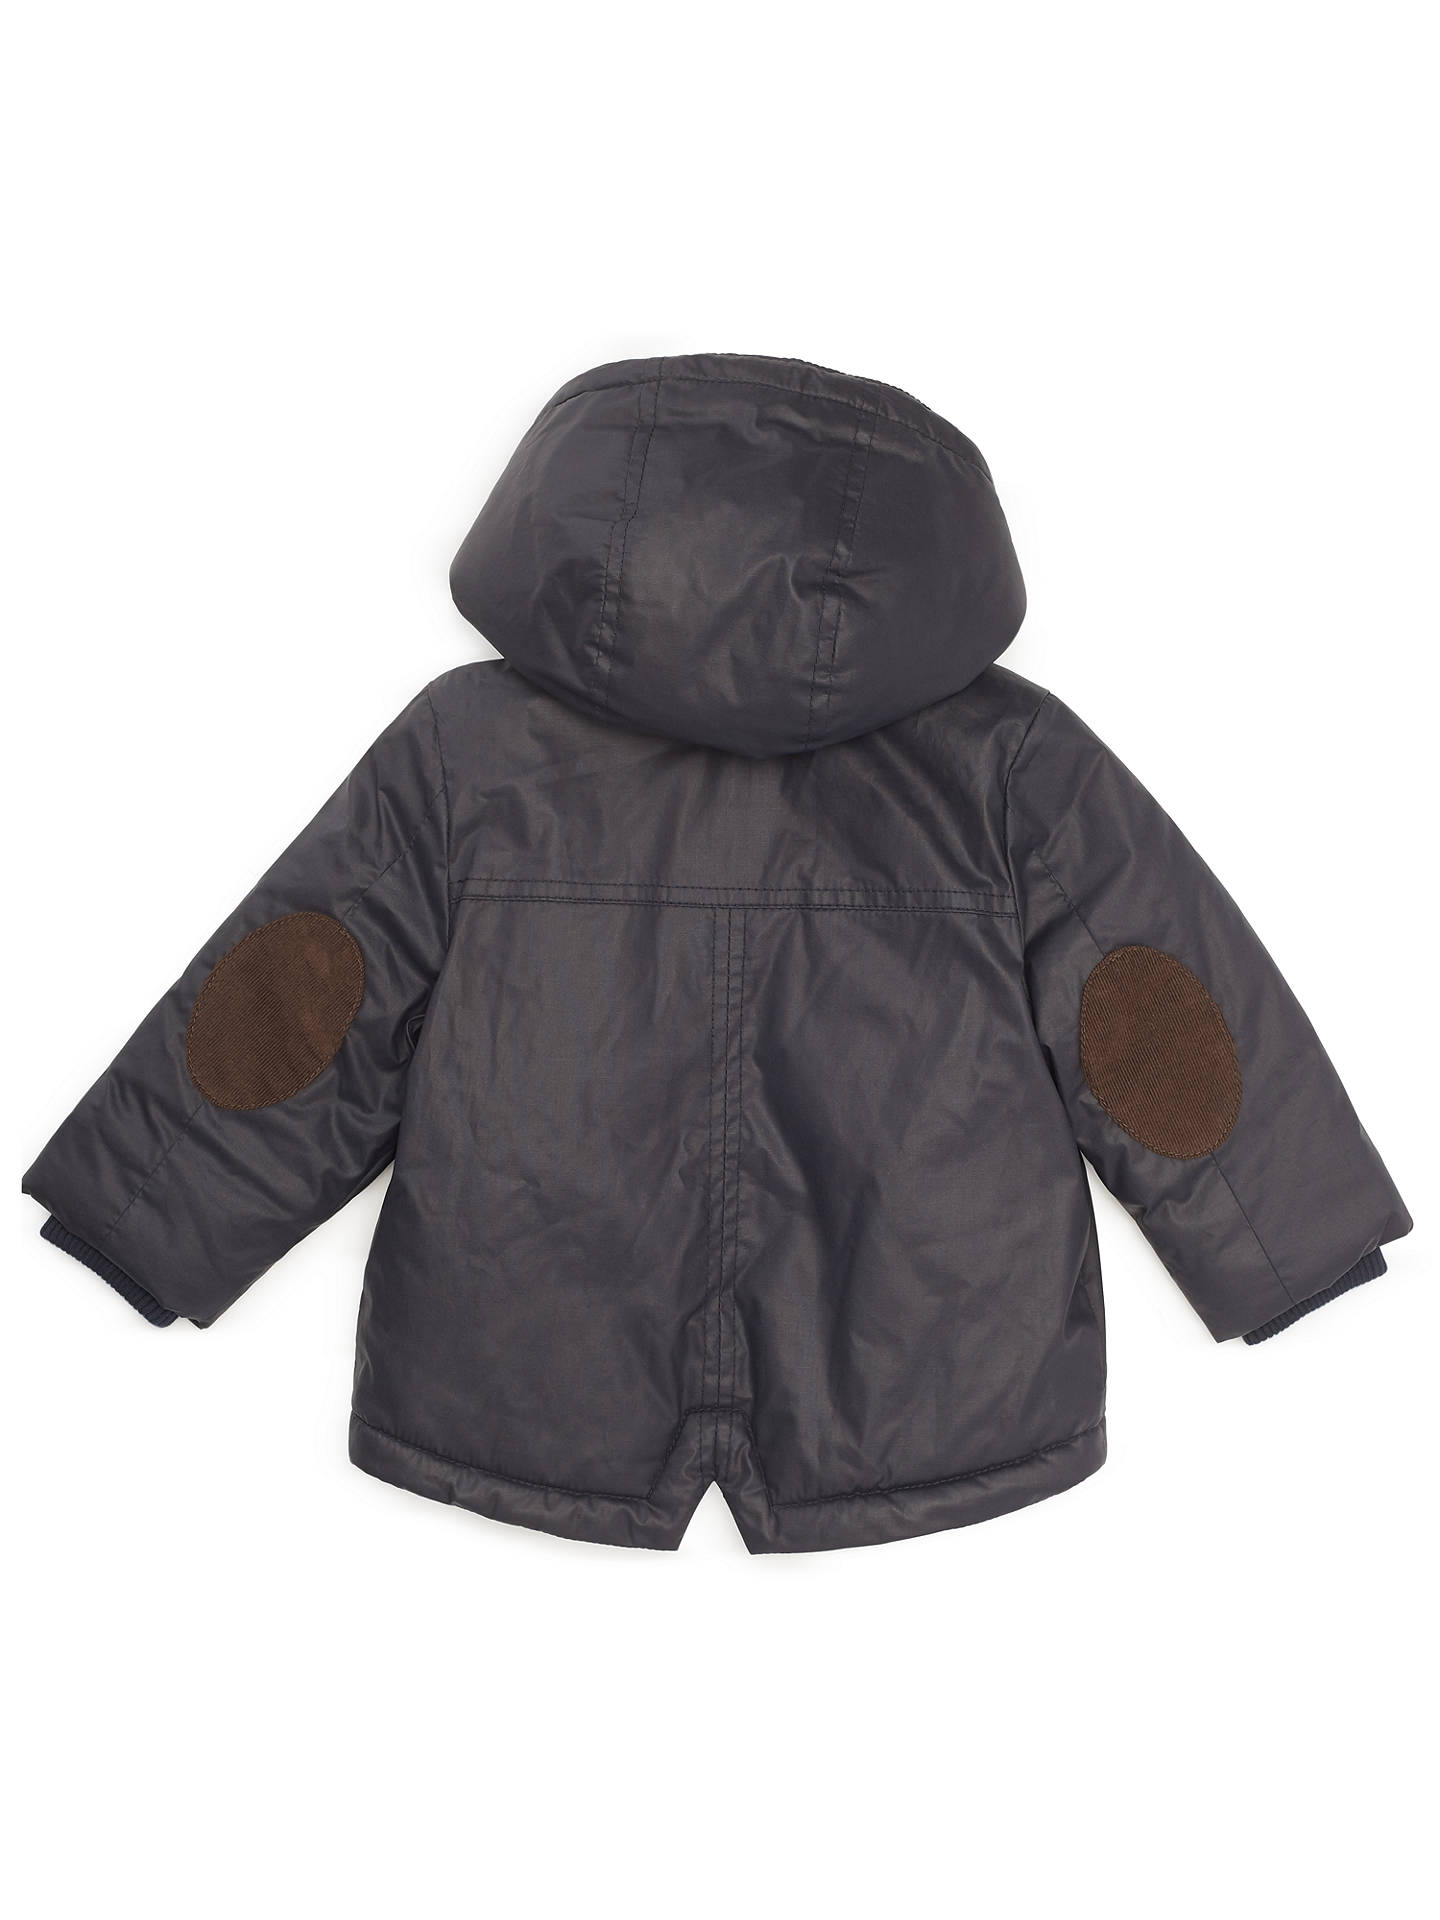 99e28d740 John Lewis   Partners Baby Waxed Jacket